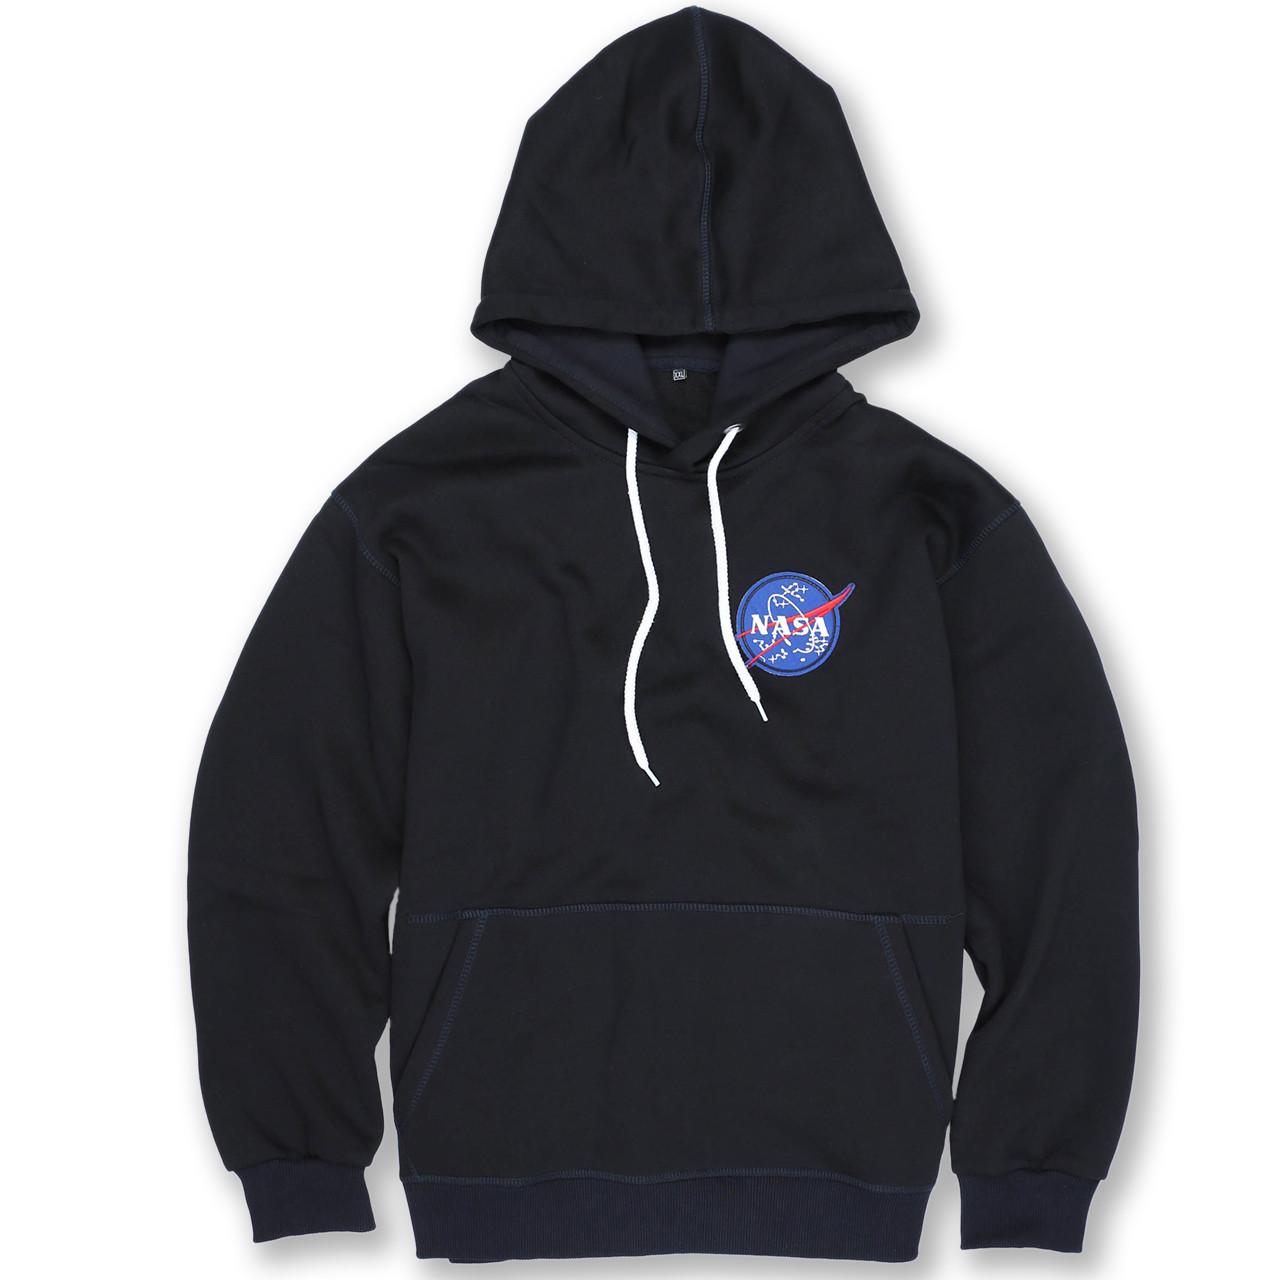 Худи осень-зима т синий NASA с патчем Т-2 DBLU XXL(Р) 20-586-203